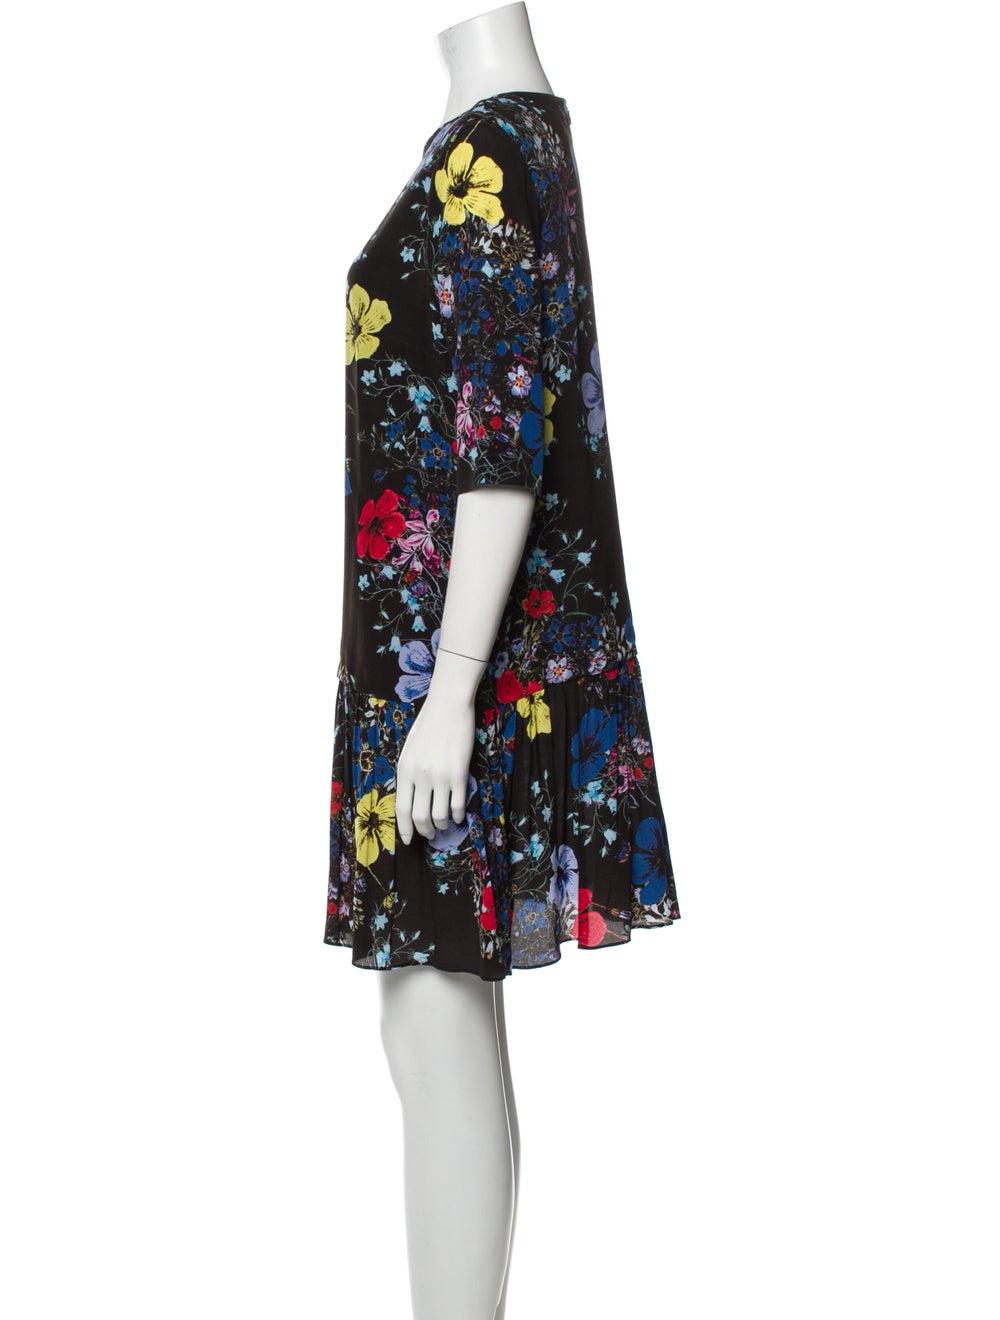 Erdem Silk Mini Dress Black - image 2